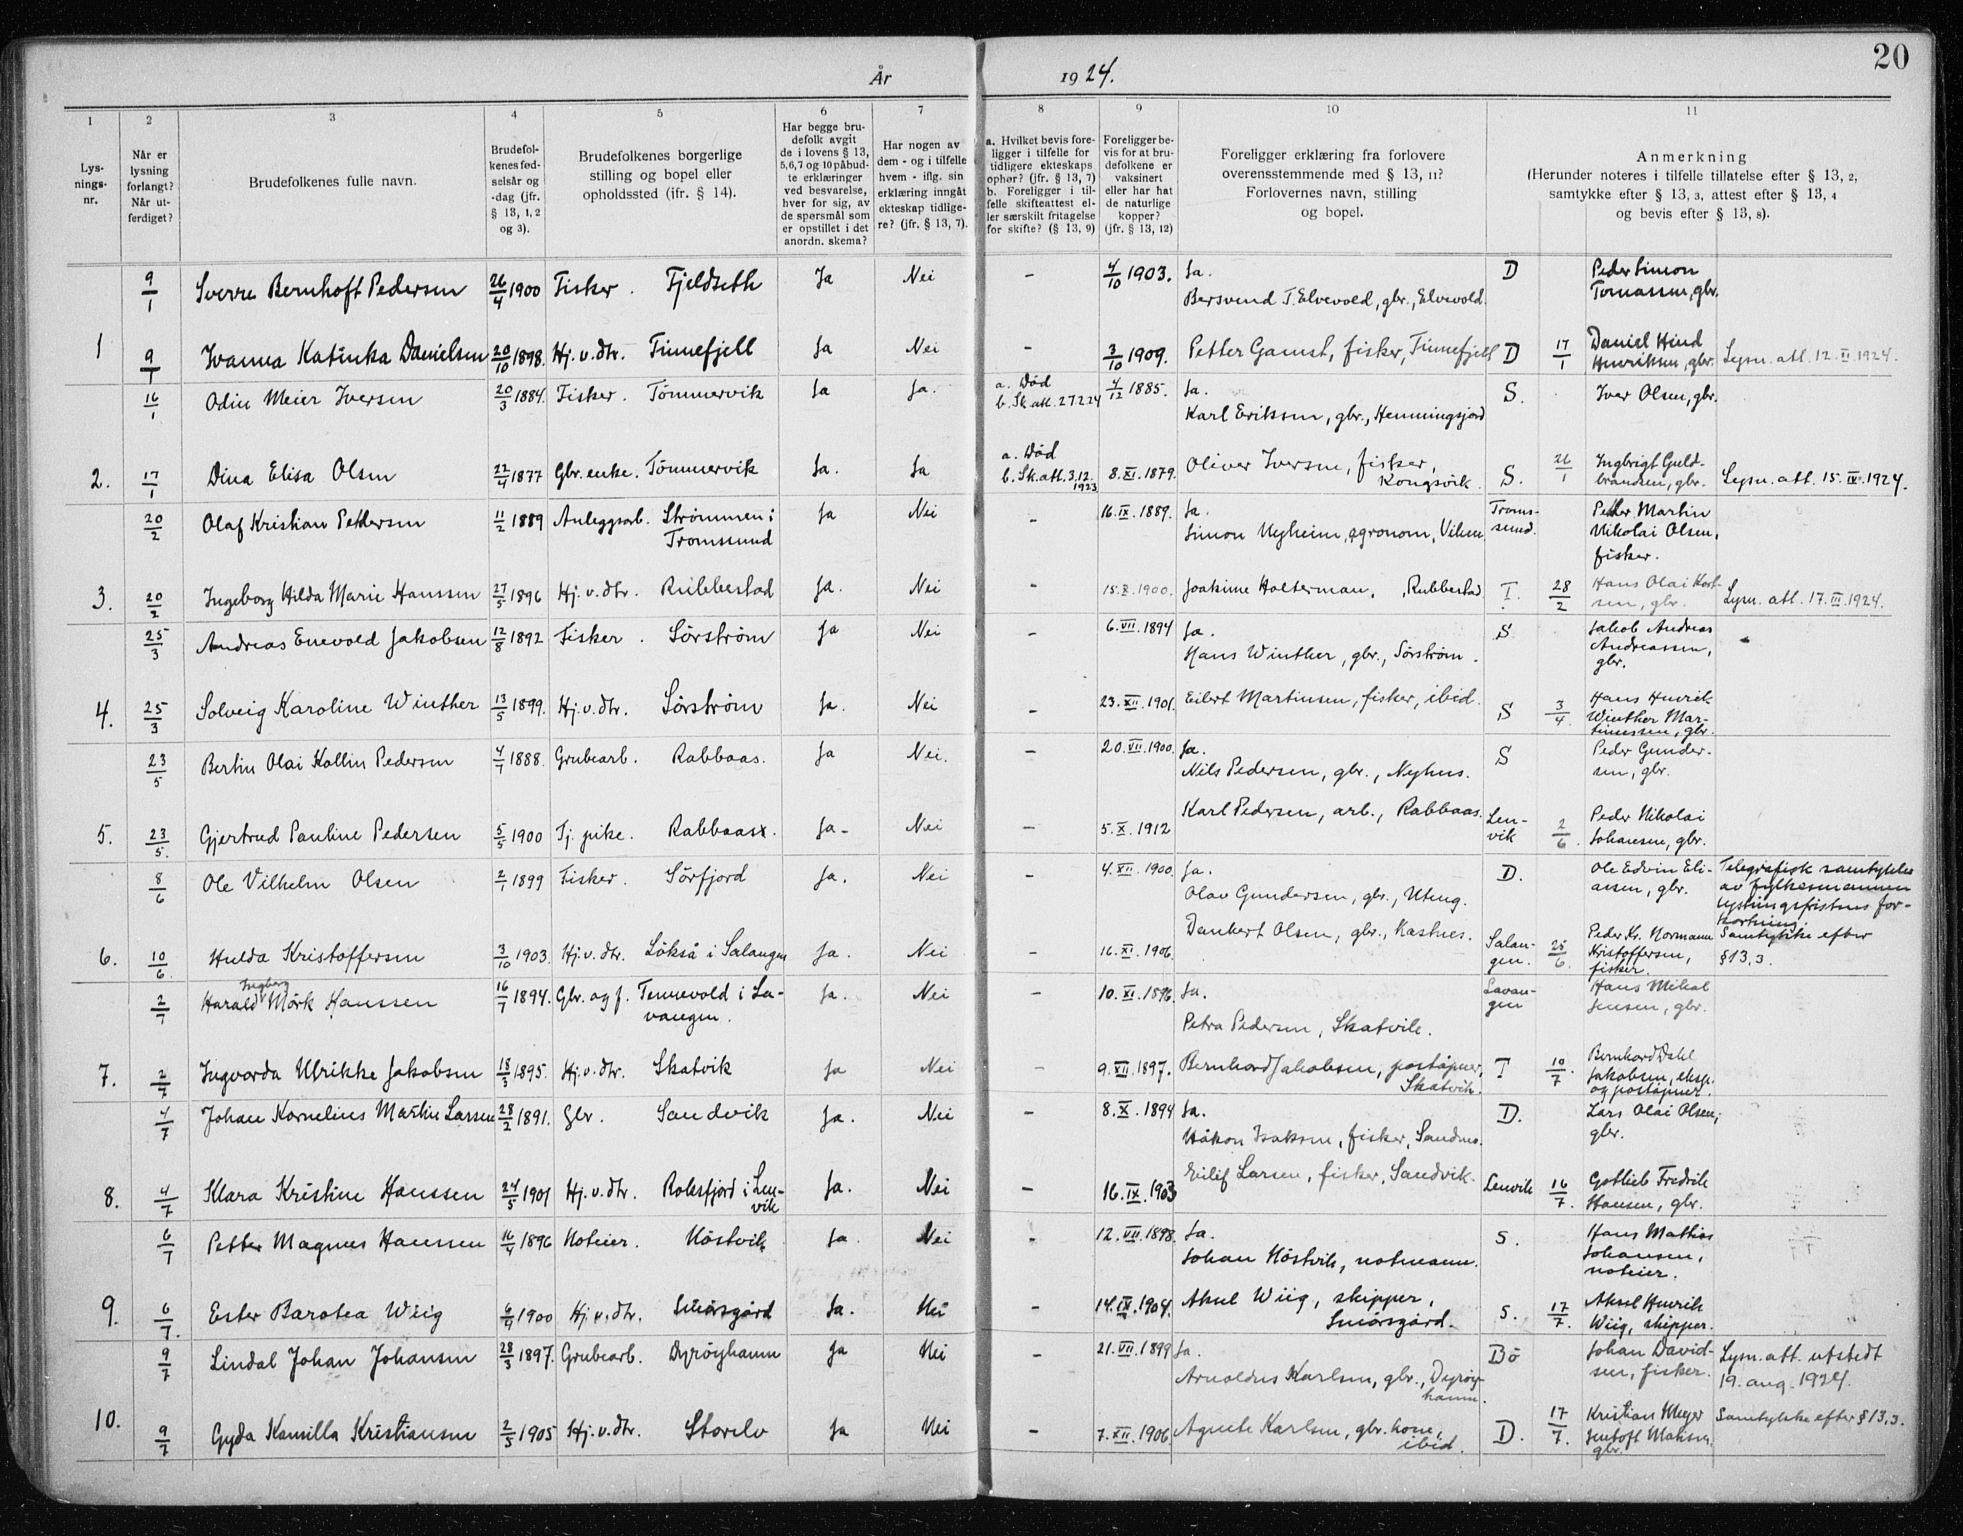 SATØ, Tranøy sokneprestkontor, J/Jc/L0053: Lysningsprotokoll nr. 53, 1919-1940, s. 20